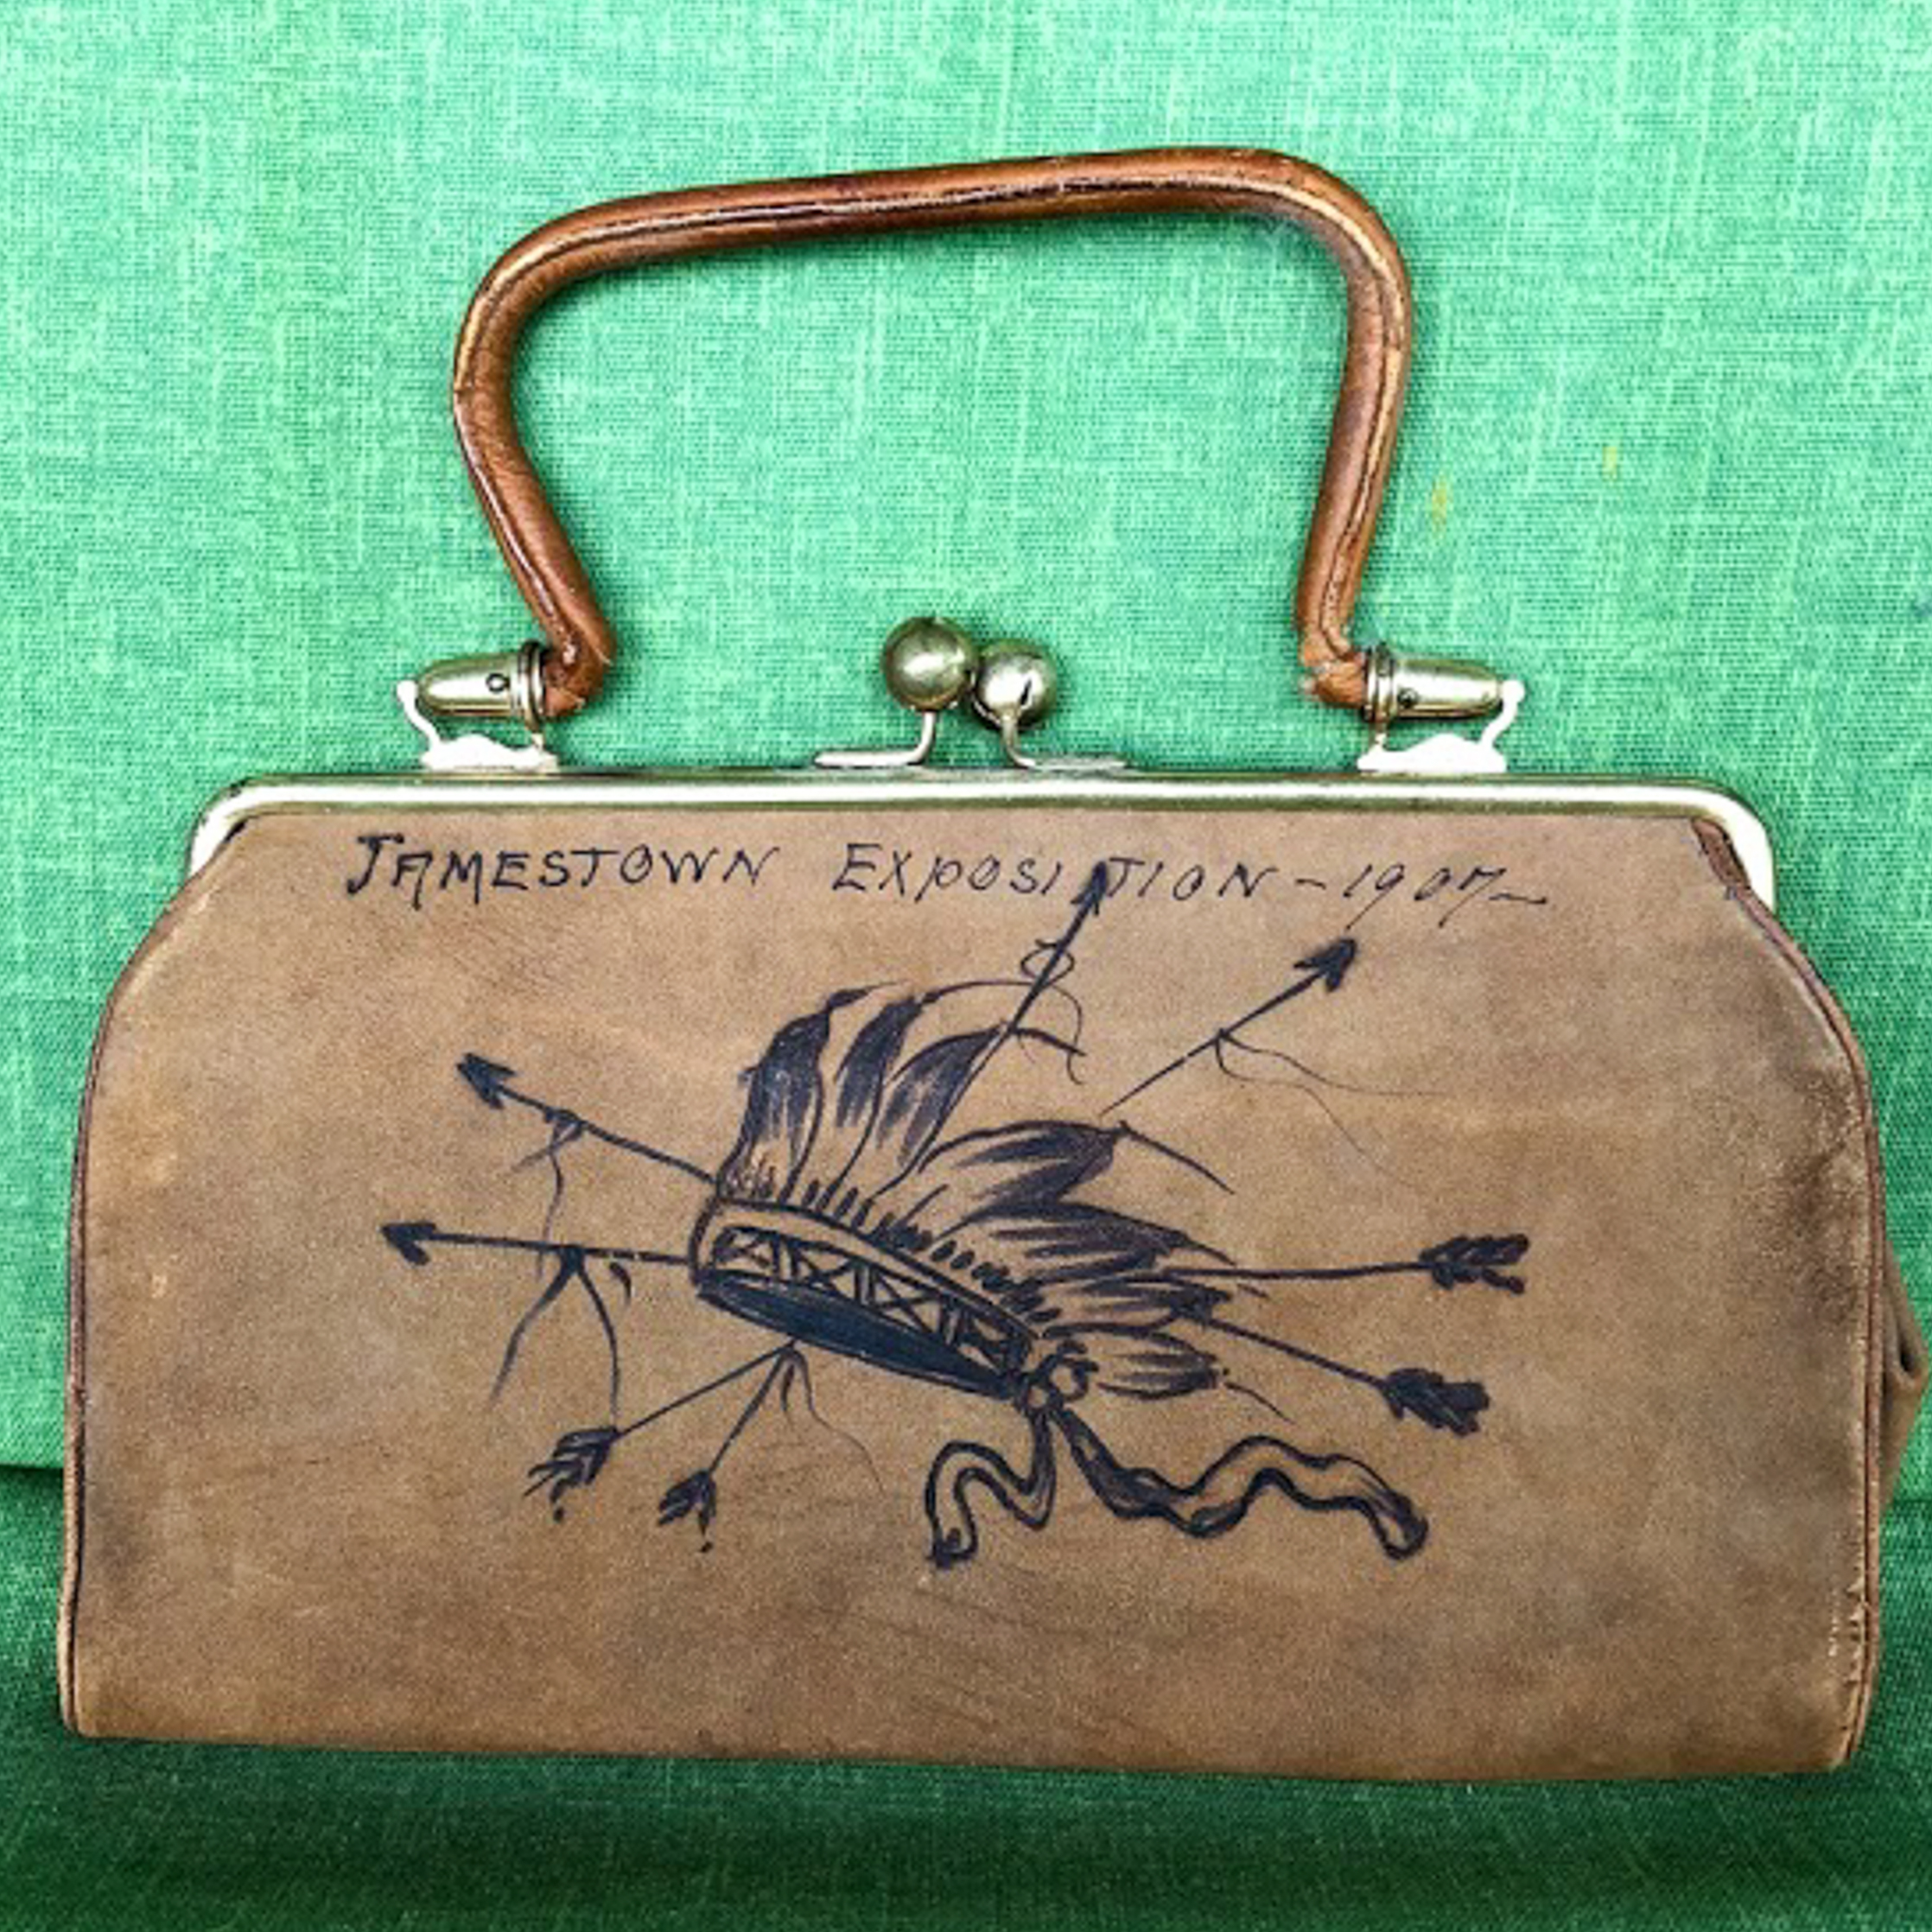 1907 Jamestown Exposition Souvenir Purse